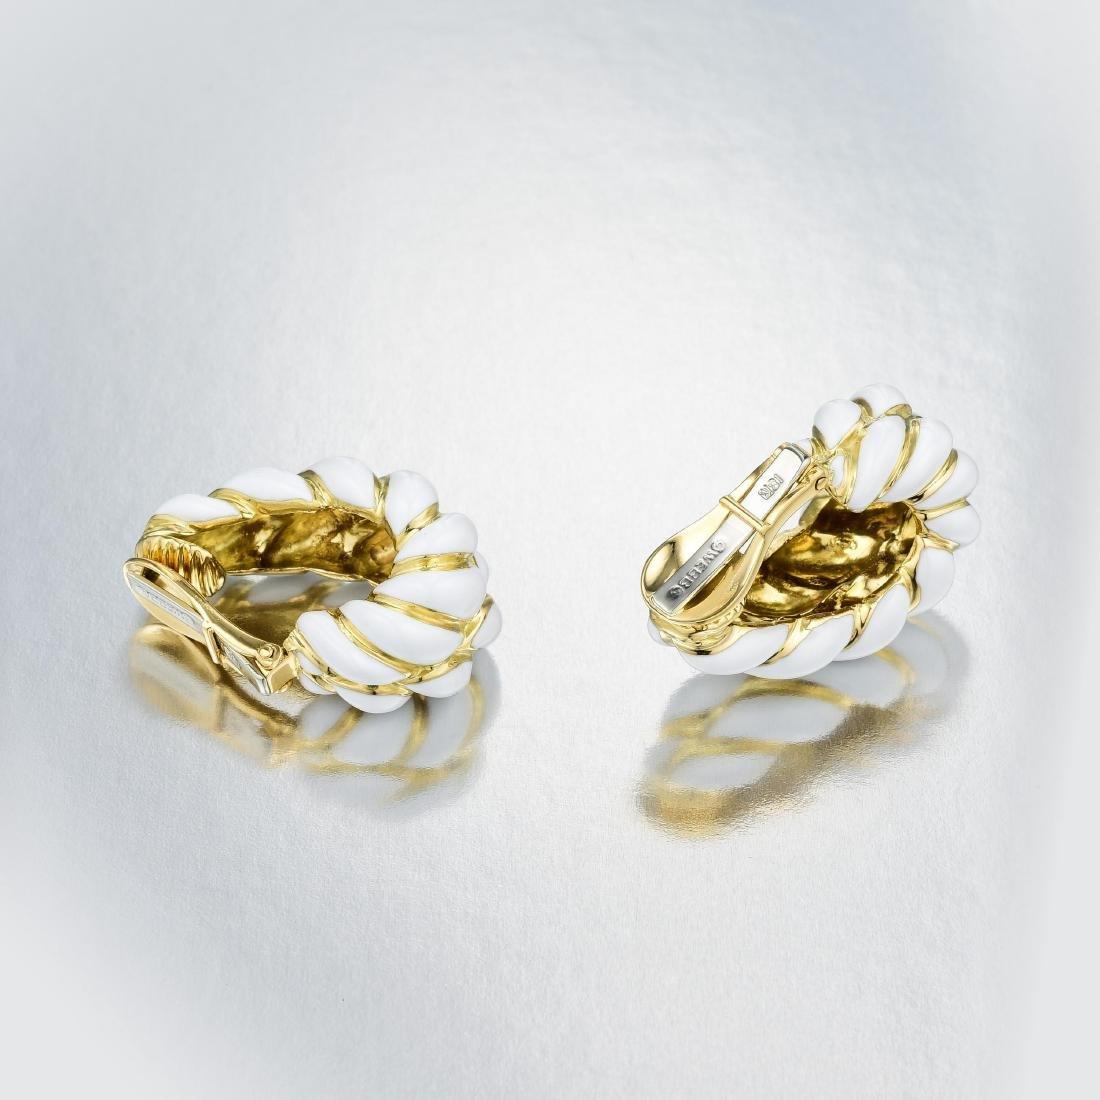 David Webb Gold and Enamel Ear Clips - 2